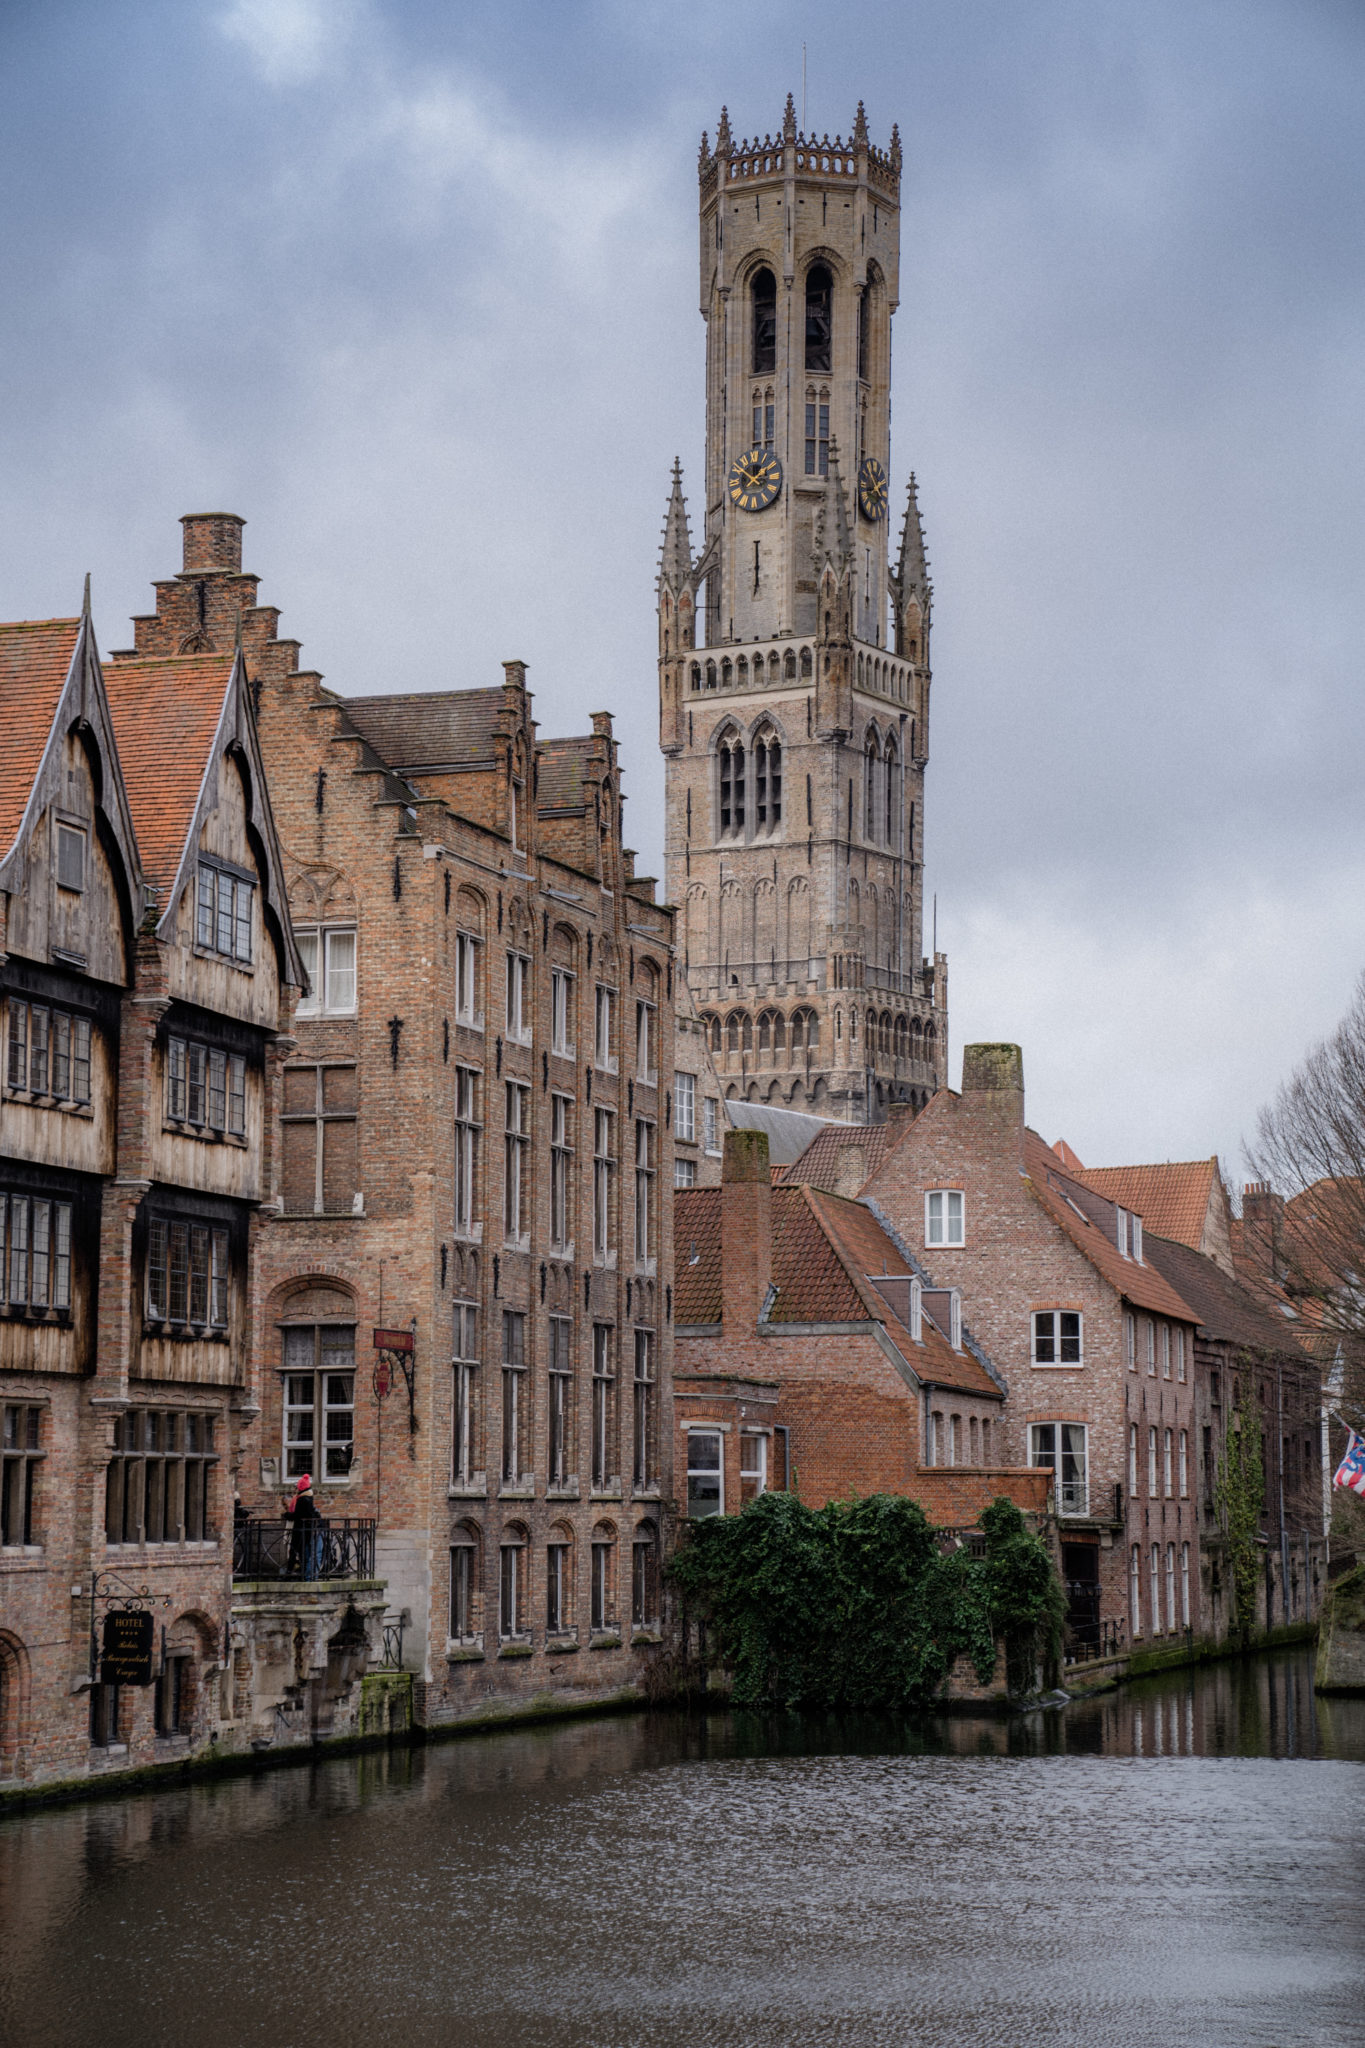 Day trip to Bruges | World of Wanderlust